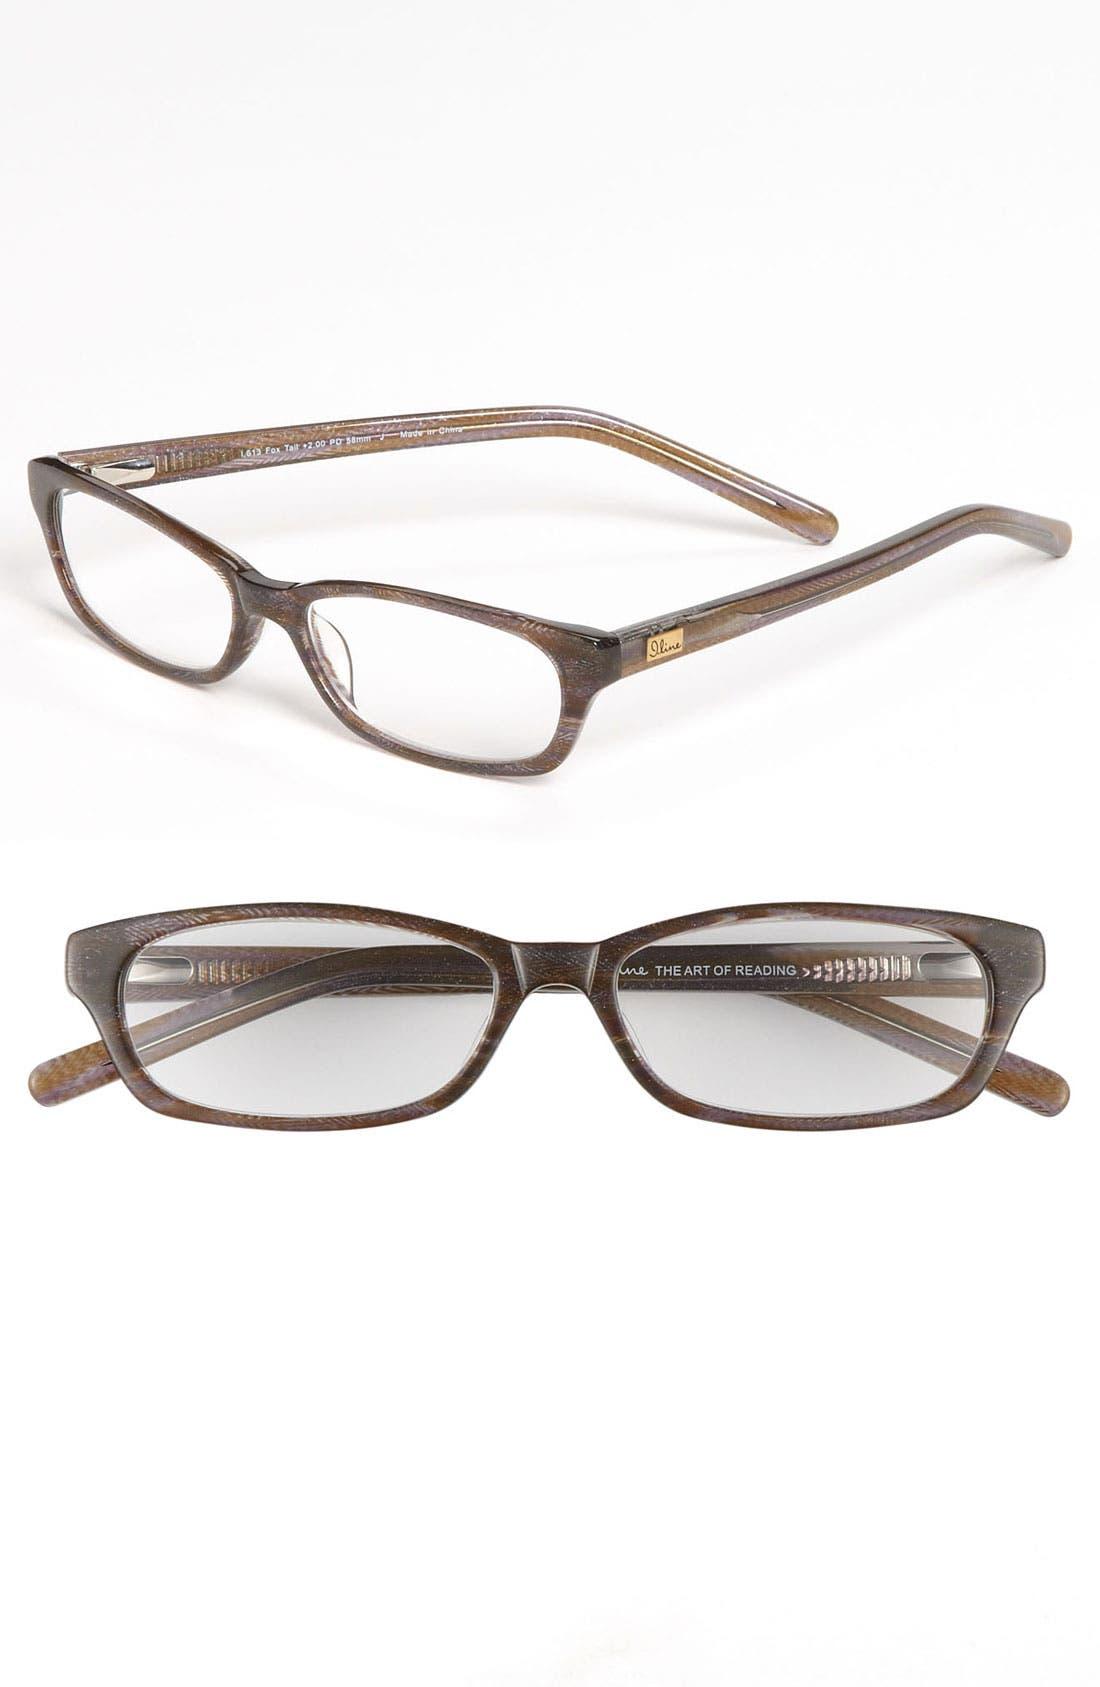 Main Image - I Line Eyewear 'Fox Tail' Reading Glasses